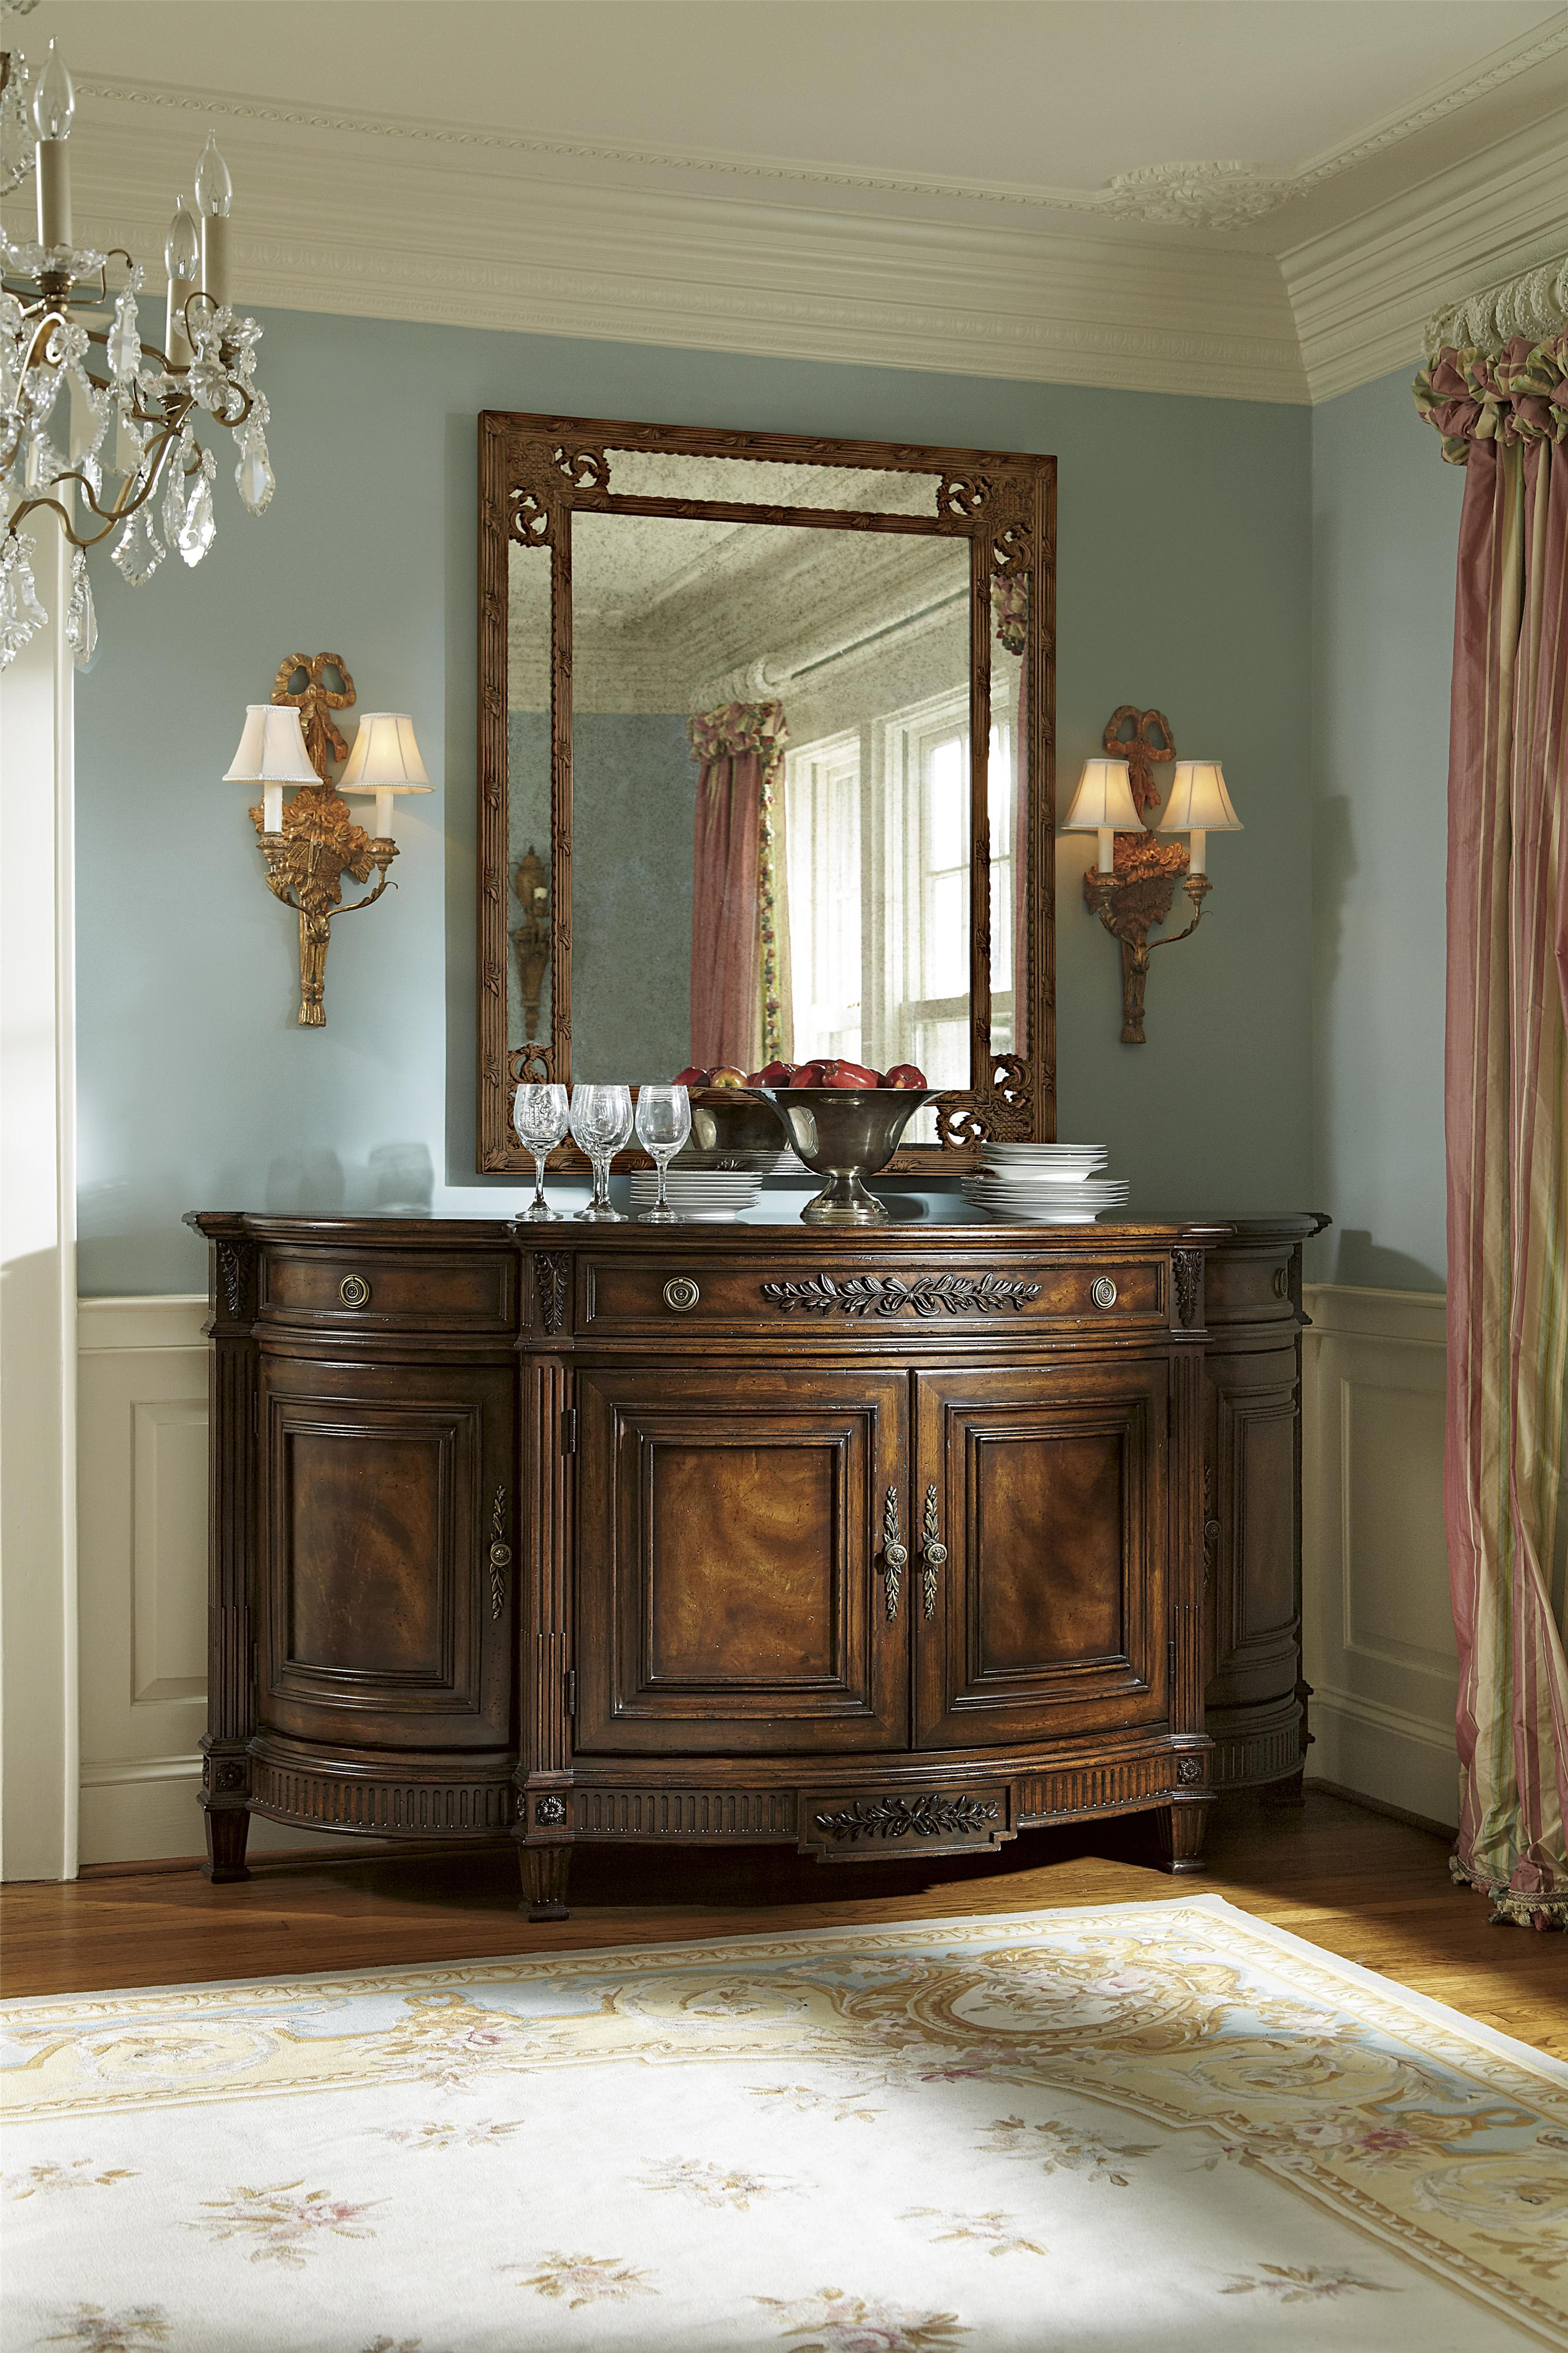 Fine Furniture Design Biltmore Banquet Credenza With